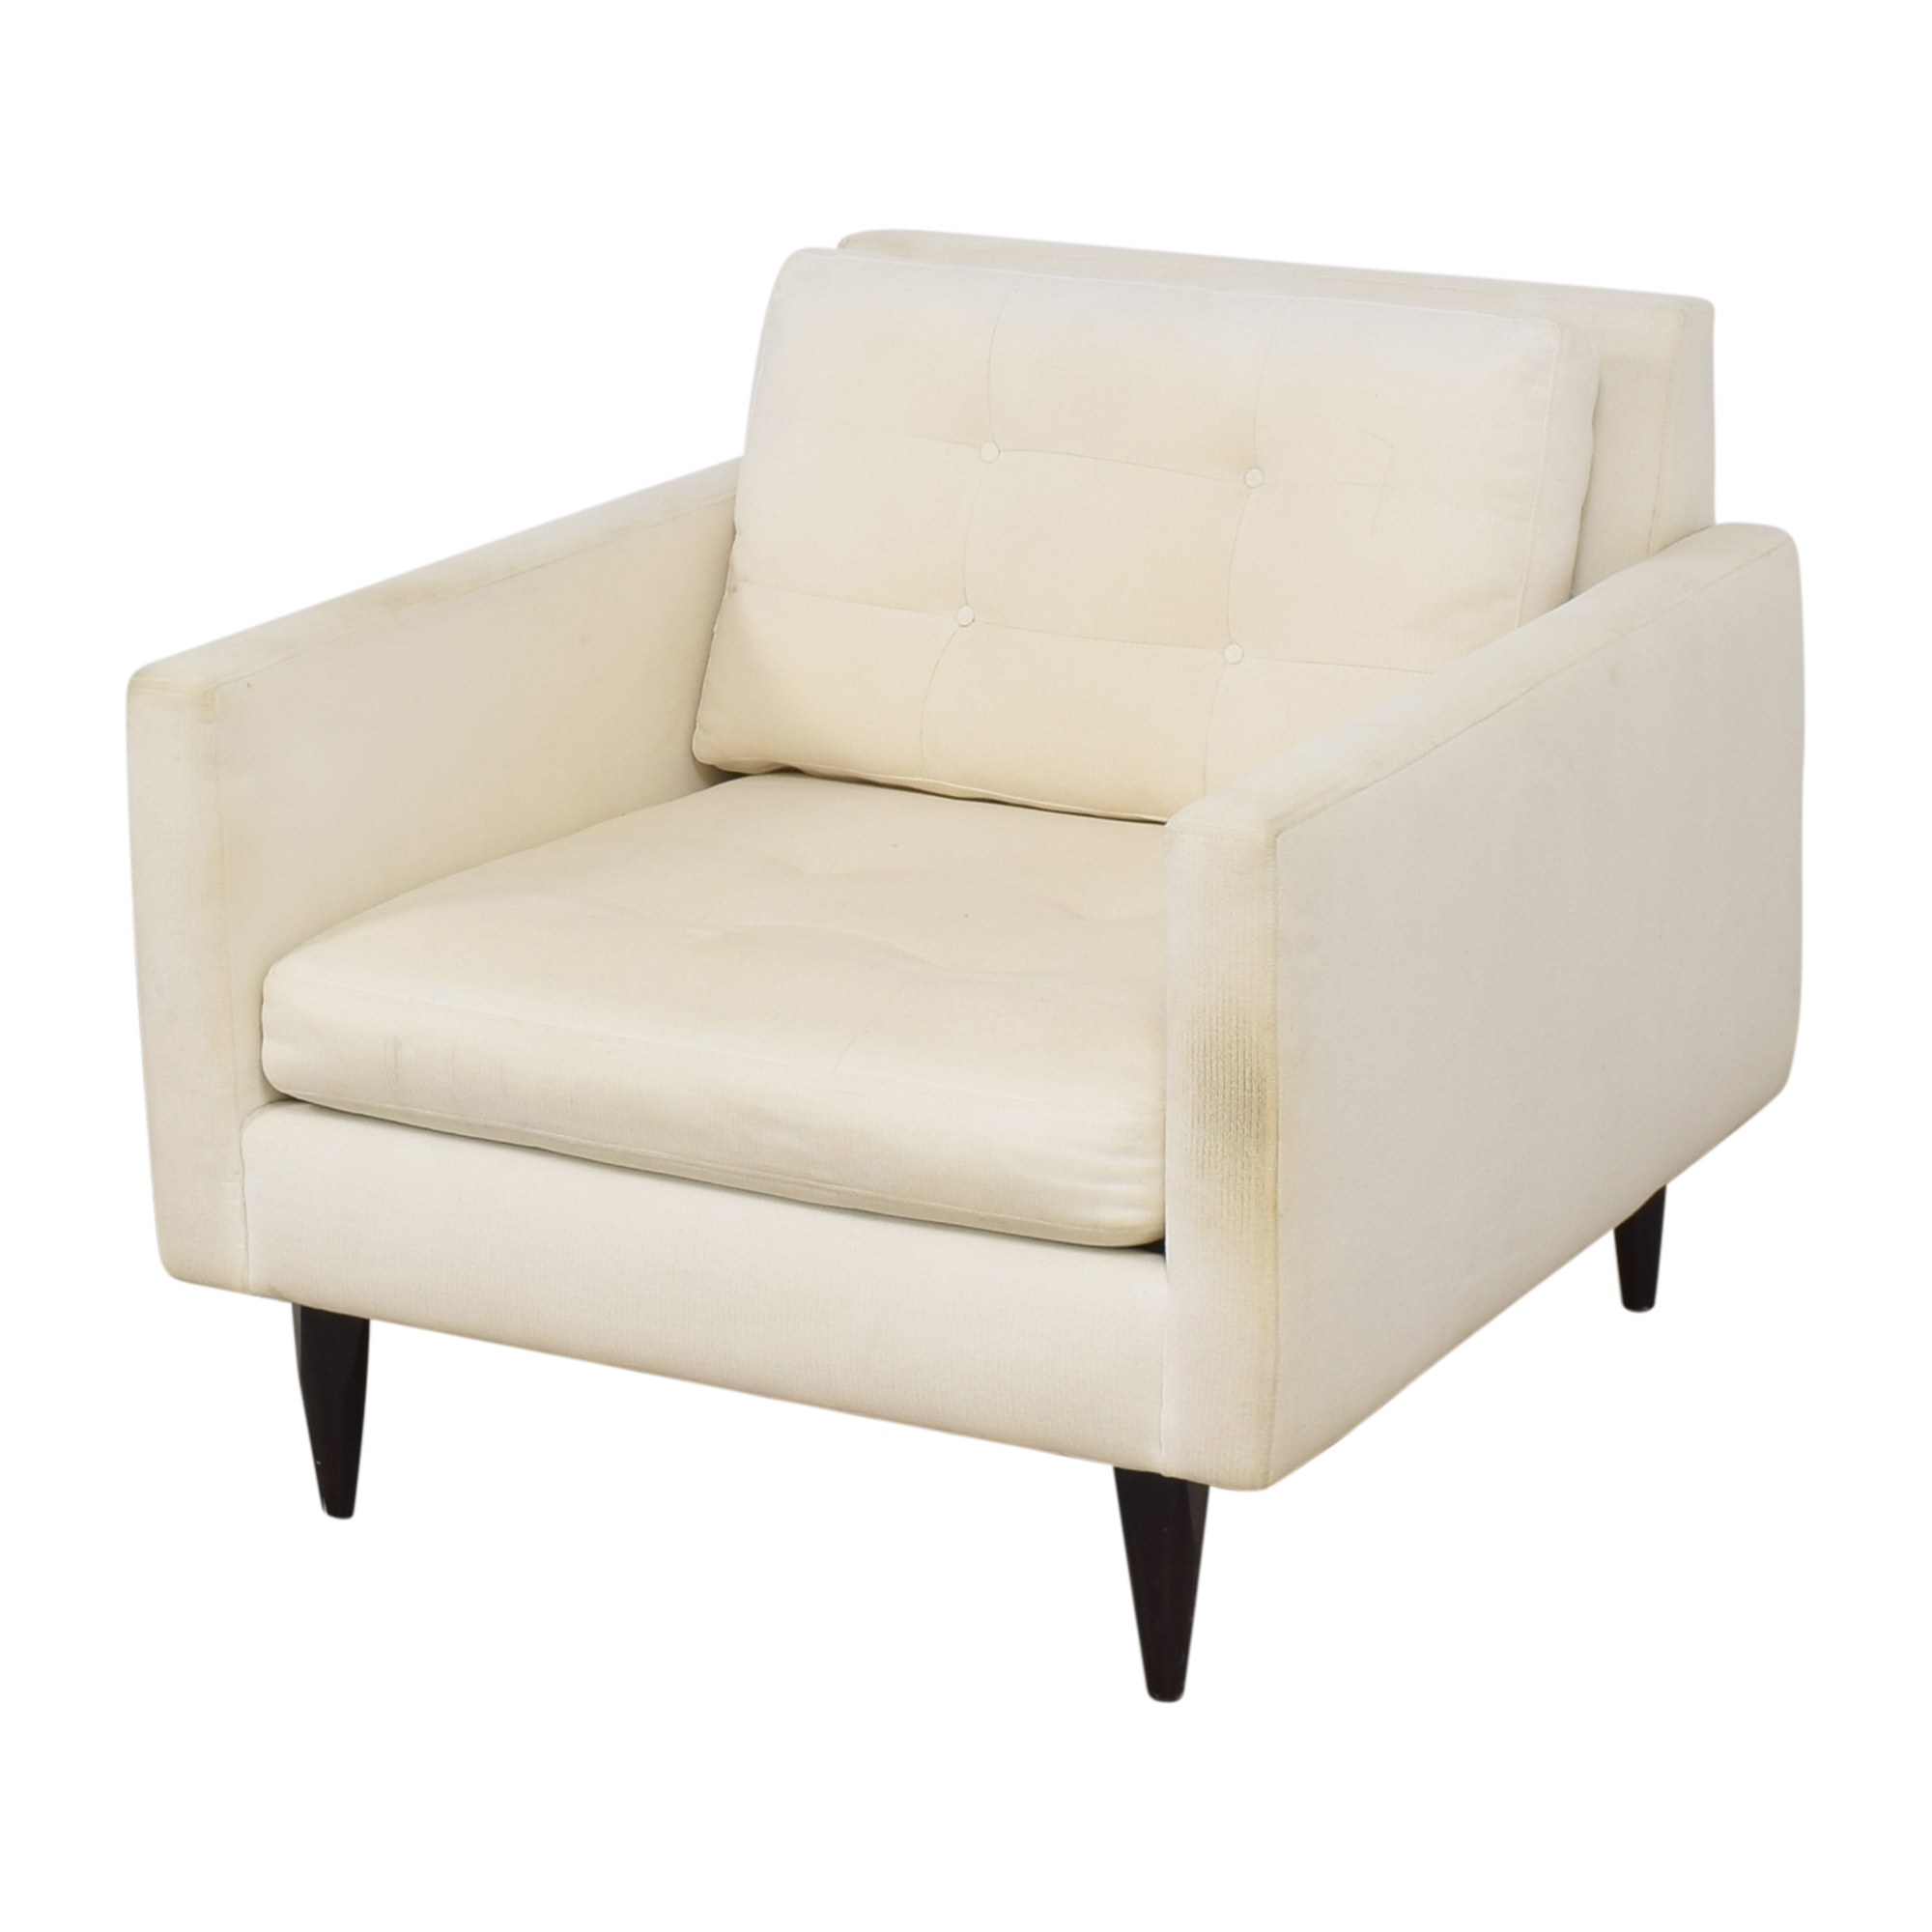 Crate & Barrel Crate & Barrel Petrie Midcentury Chair ma